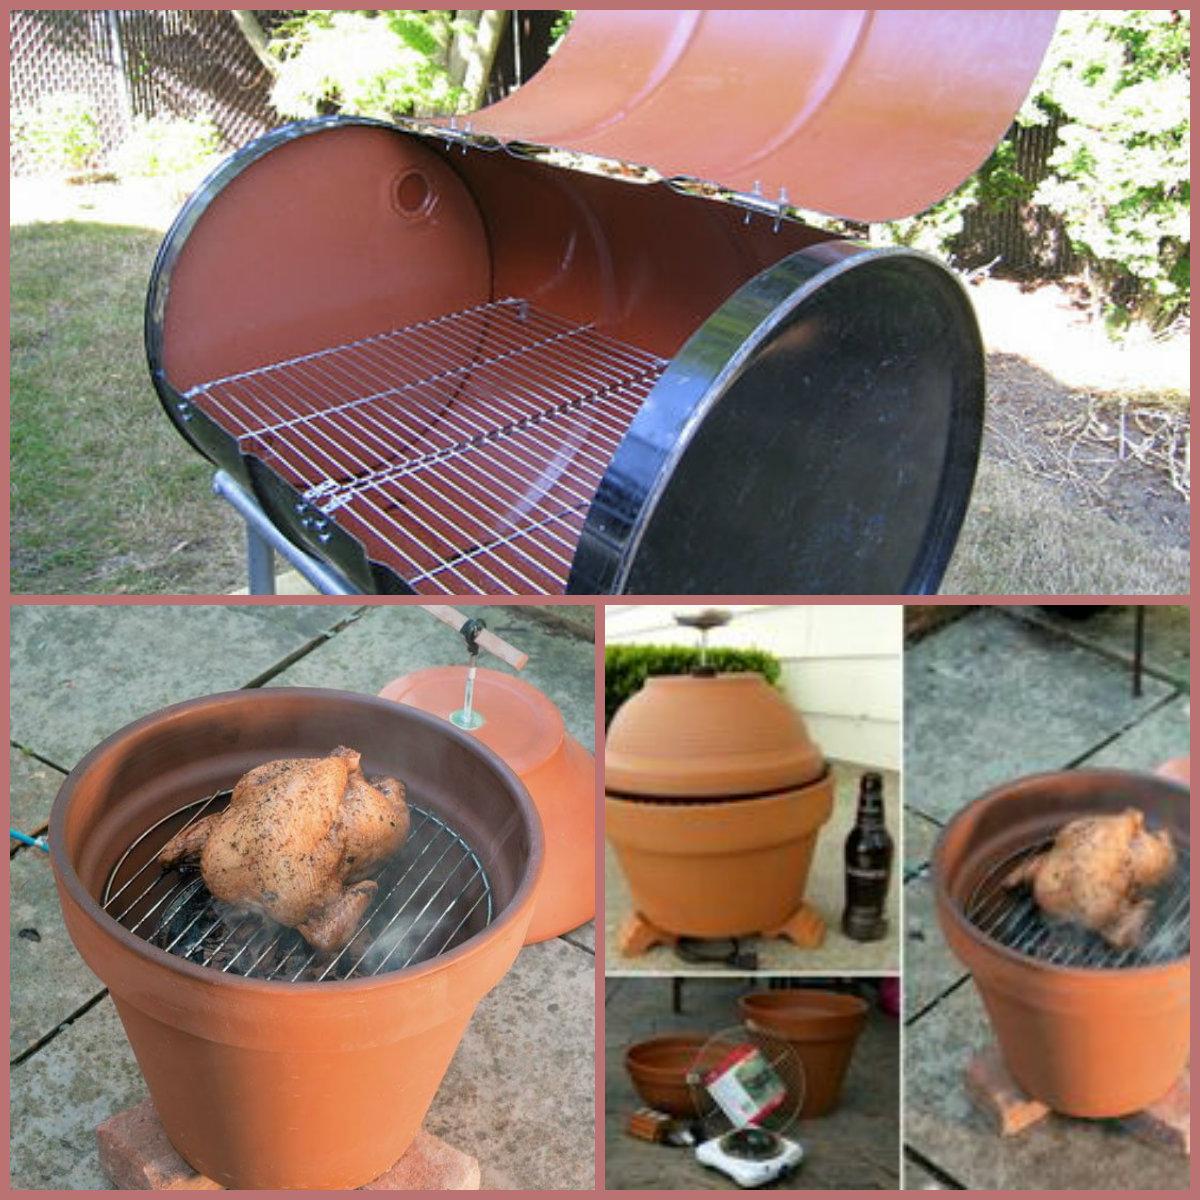 Tantissime idee per un barbecue fai da te for Bbq affumicatore fai da te